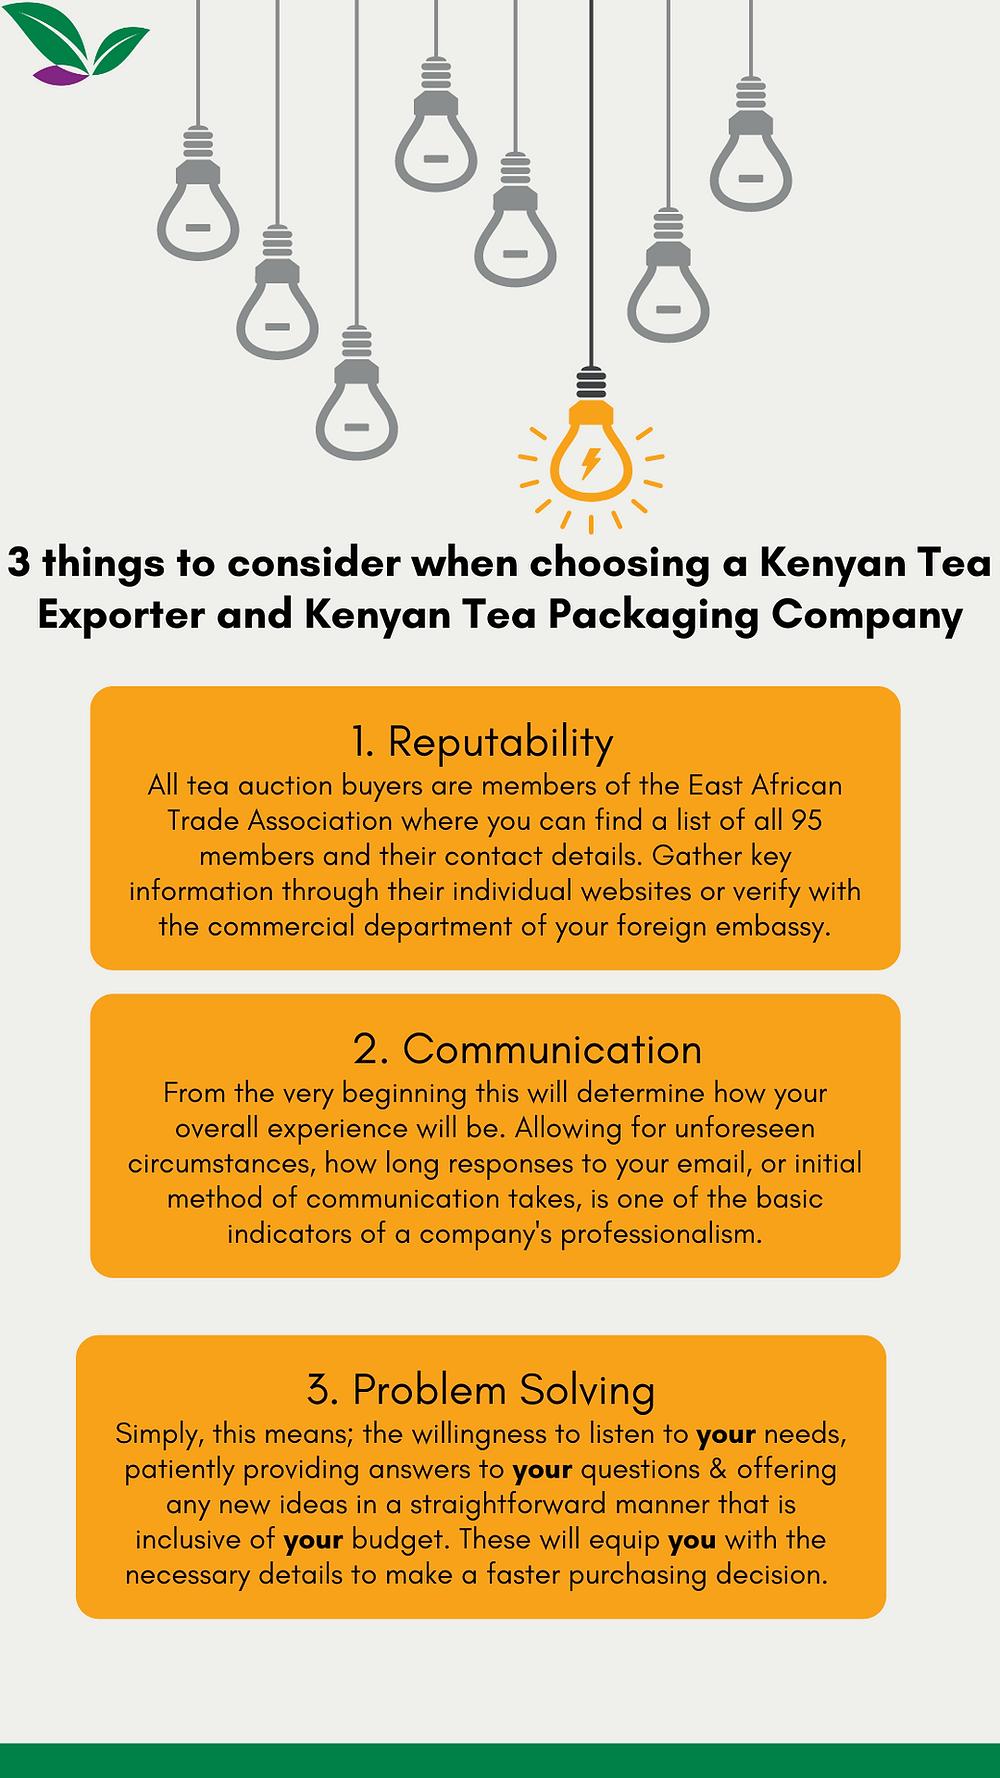 How to choose Kenyan tea suppliers and Kenyan tea companies